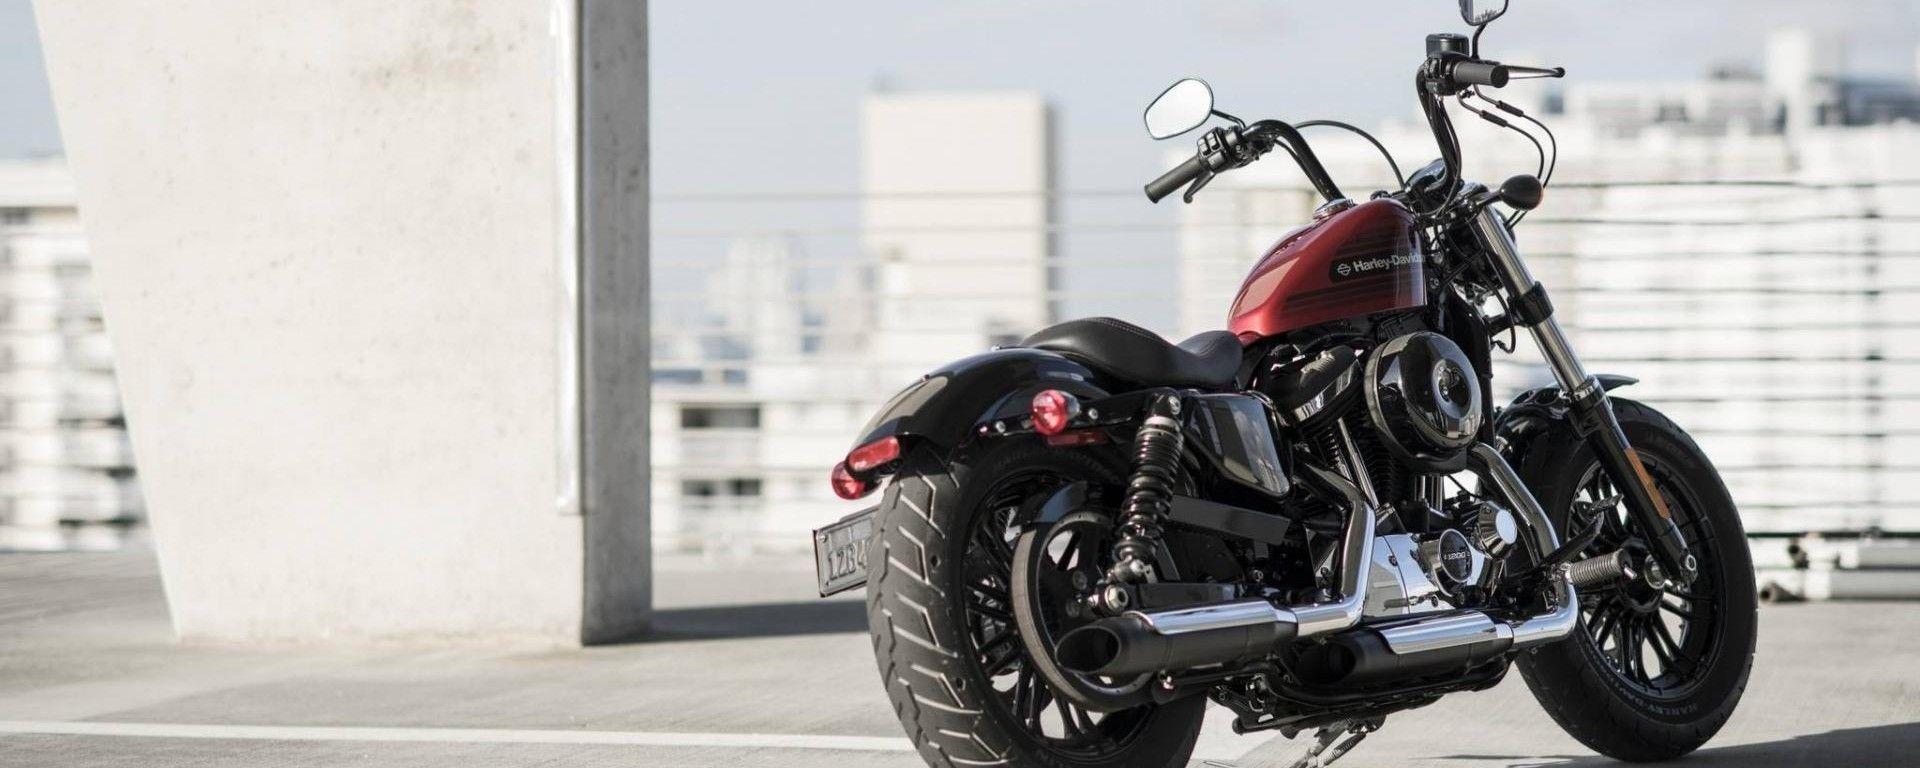 Dazi USA-Europa: Harley Davidson non modificherà i listini